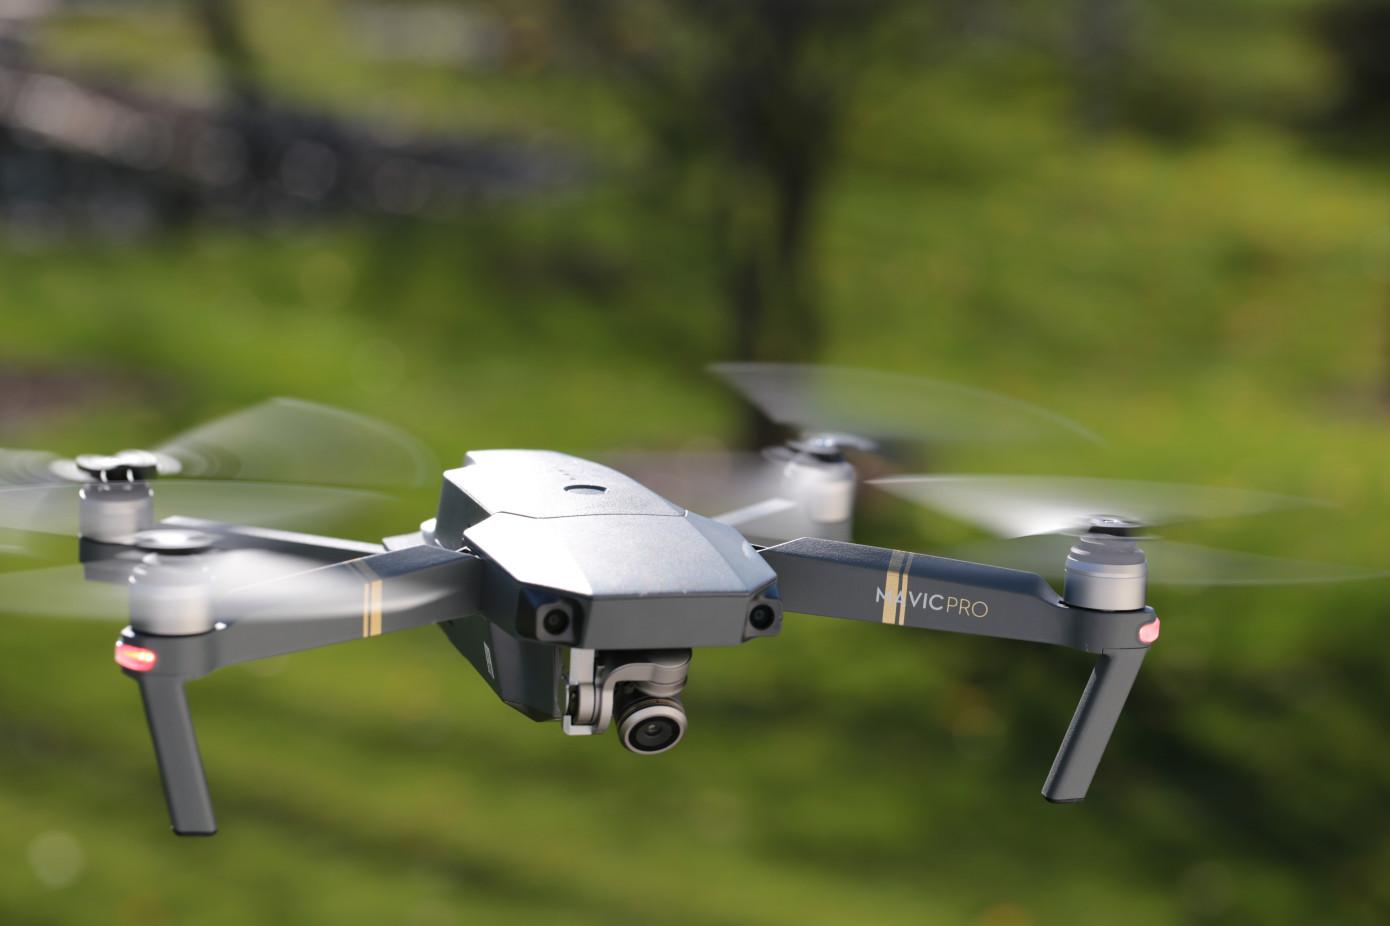 A DJI Mavic Drone